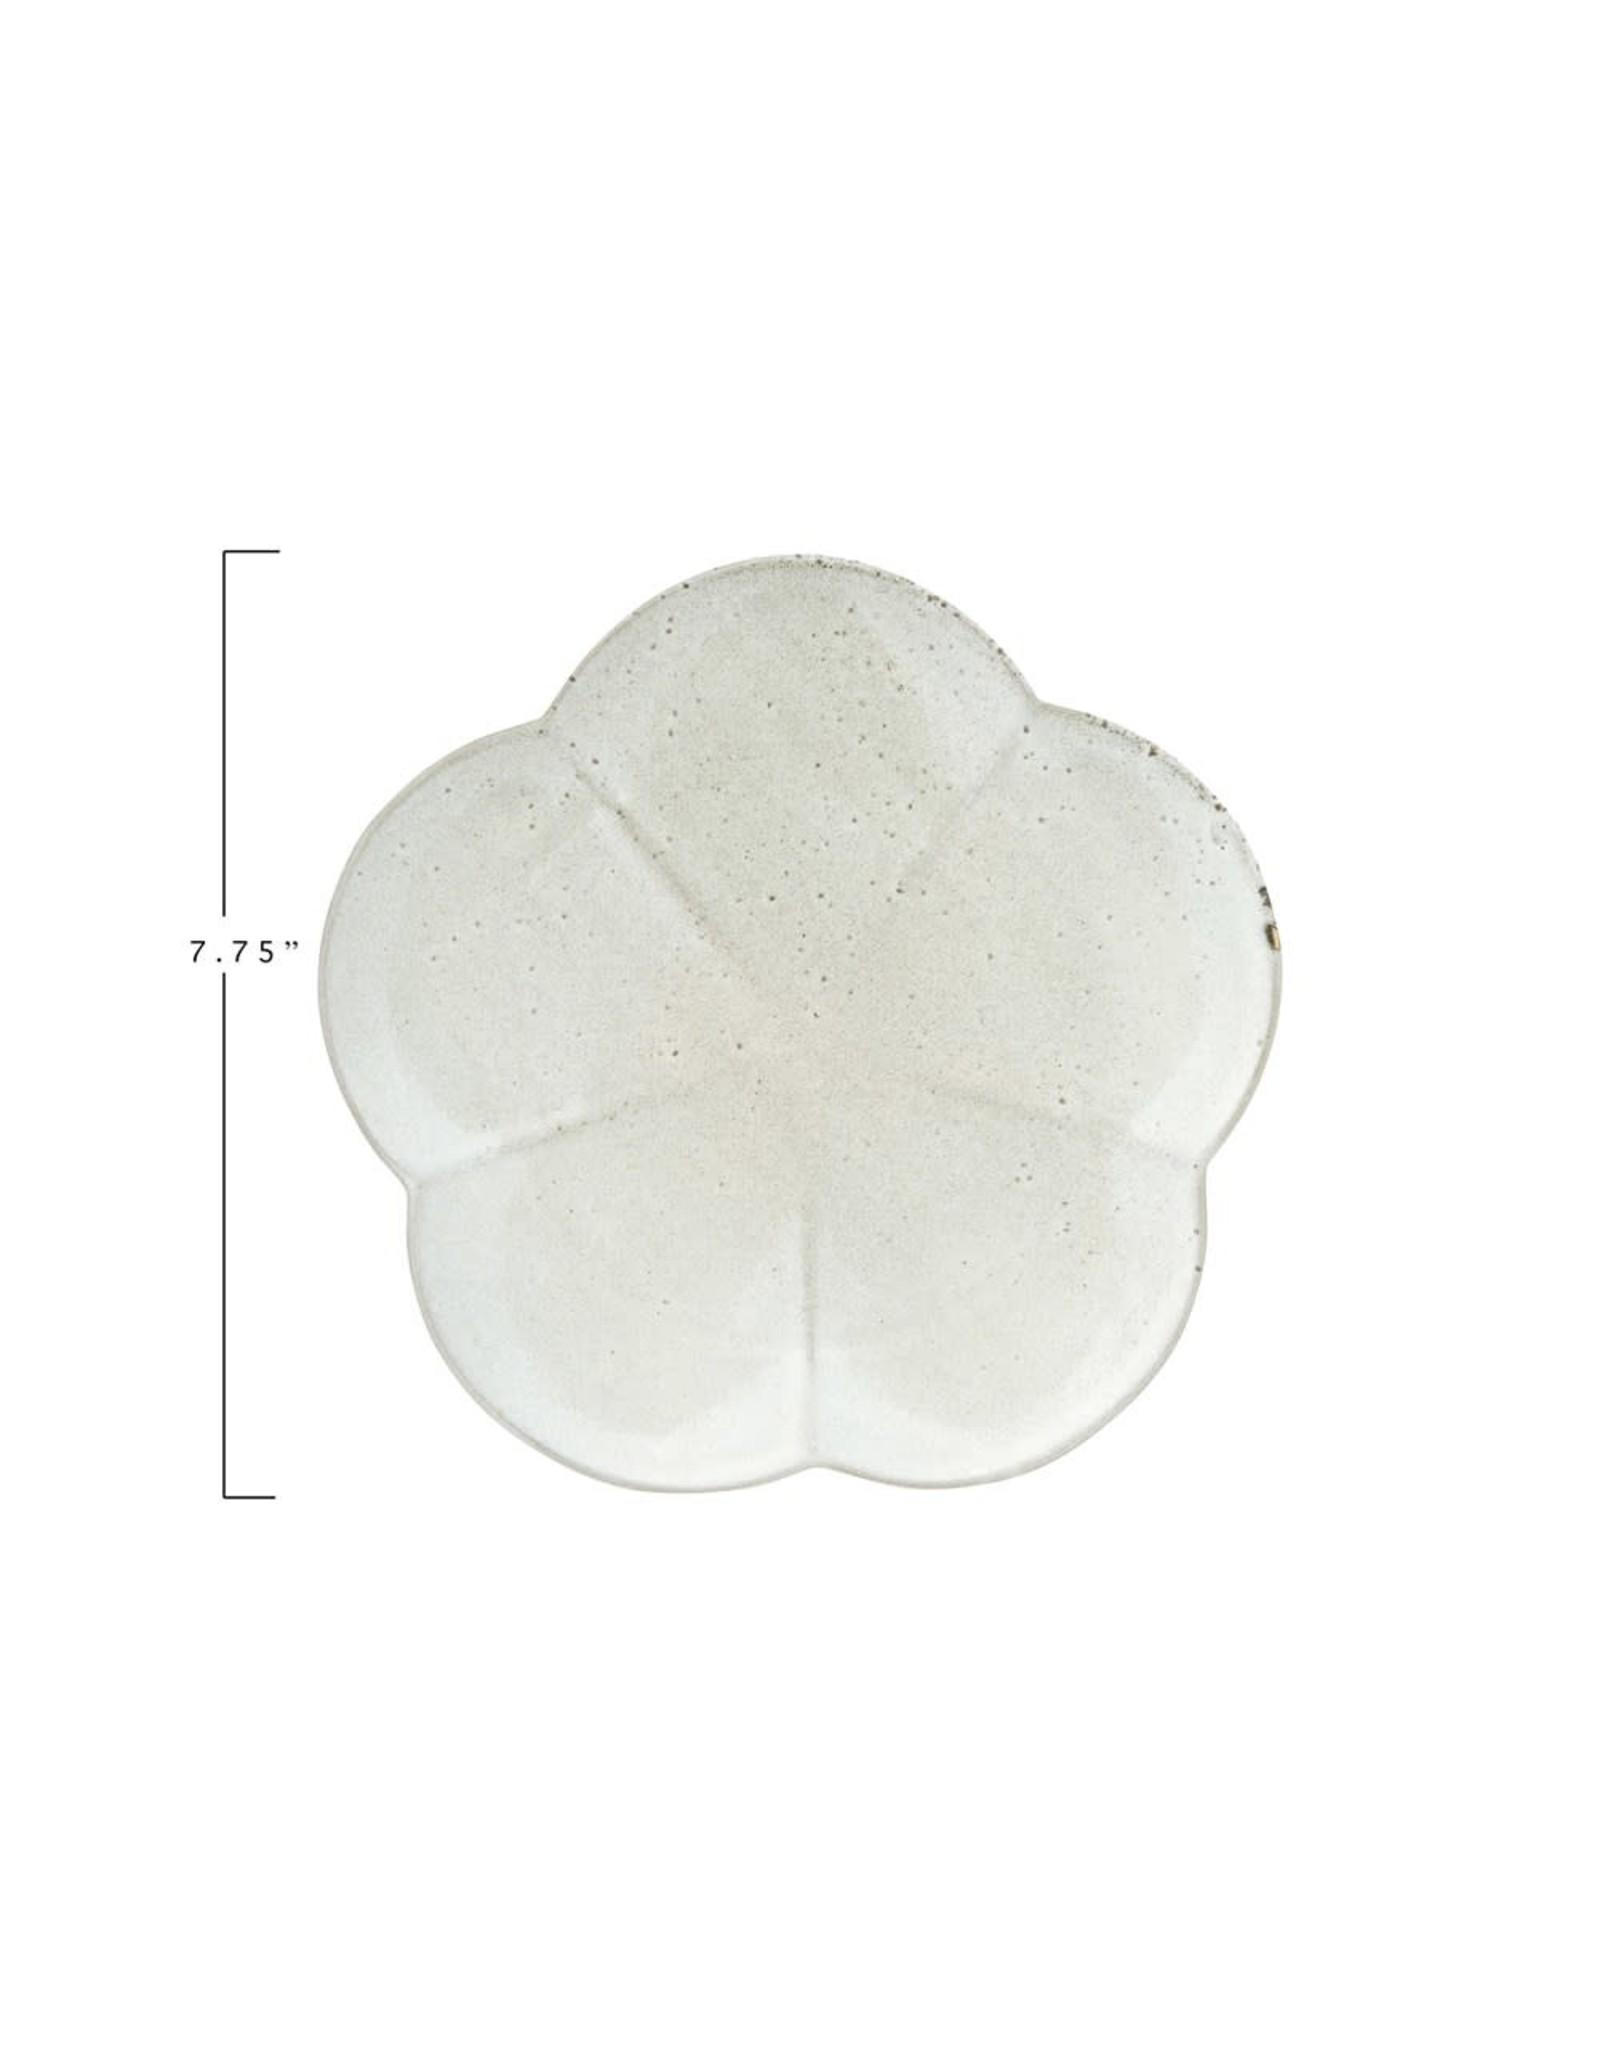 "Creative Co-op 7 3/4"" Stoneware Flower Plate - grey"